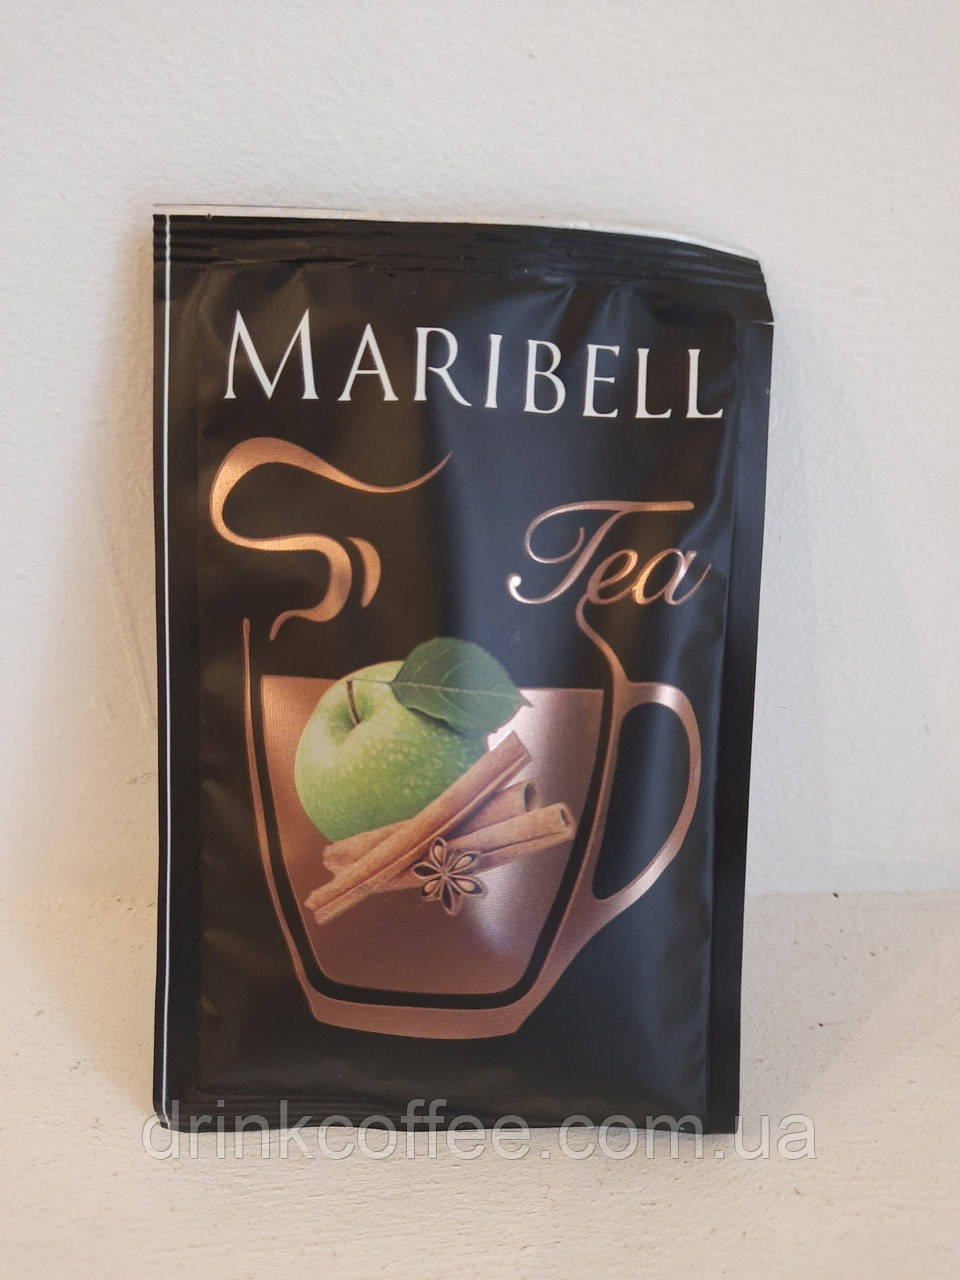 Чай-концентрат яблоко-корица ТМ Maribell